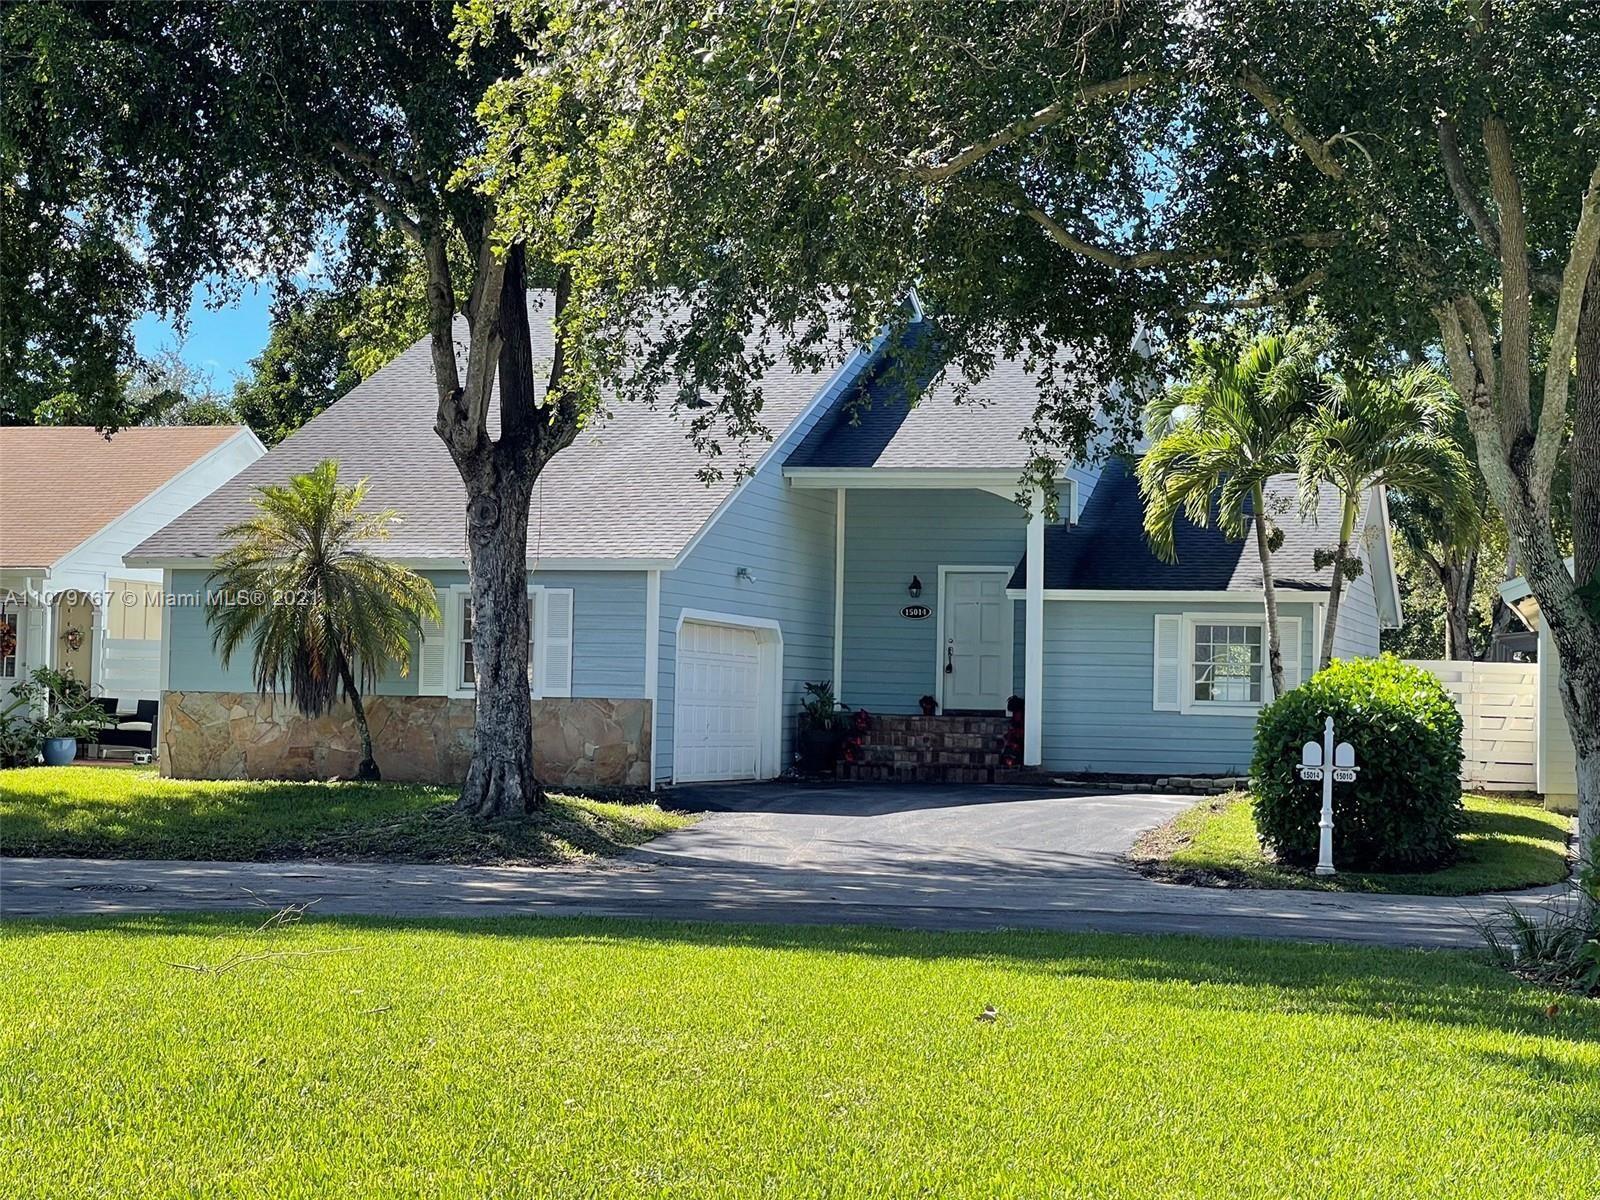 15014 SW 141st Pl, Miami, FL 33186 - #: A11079767